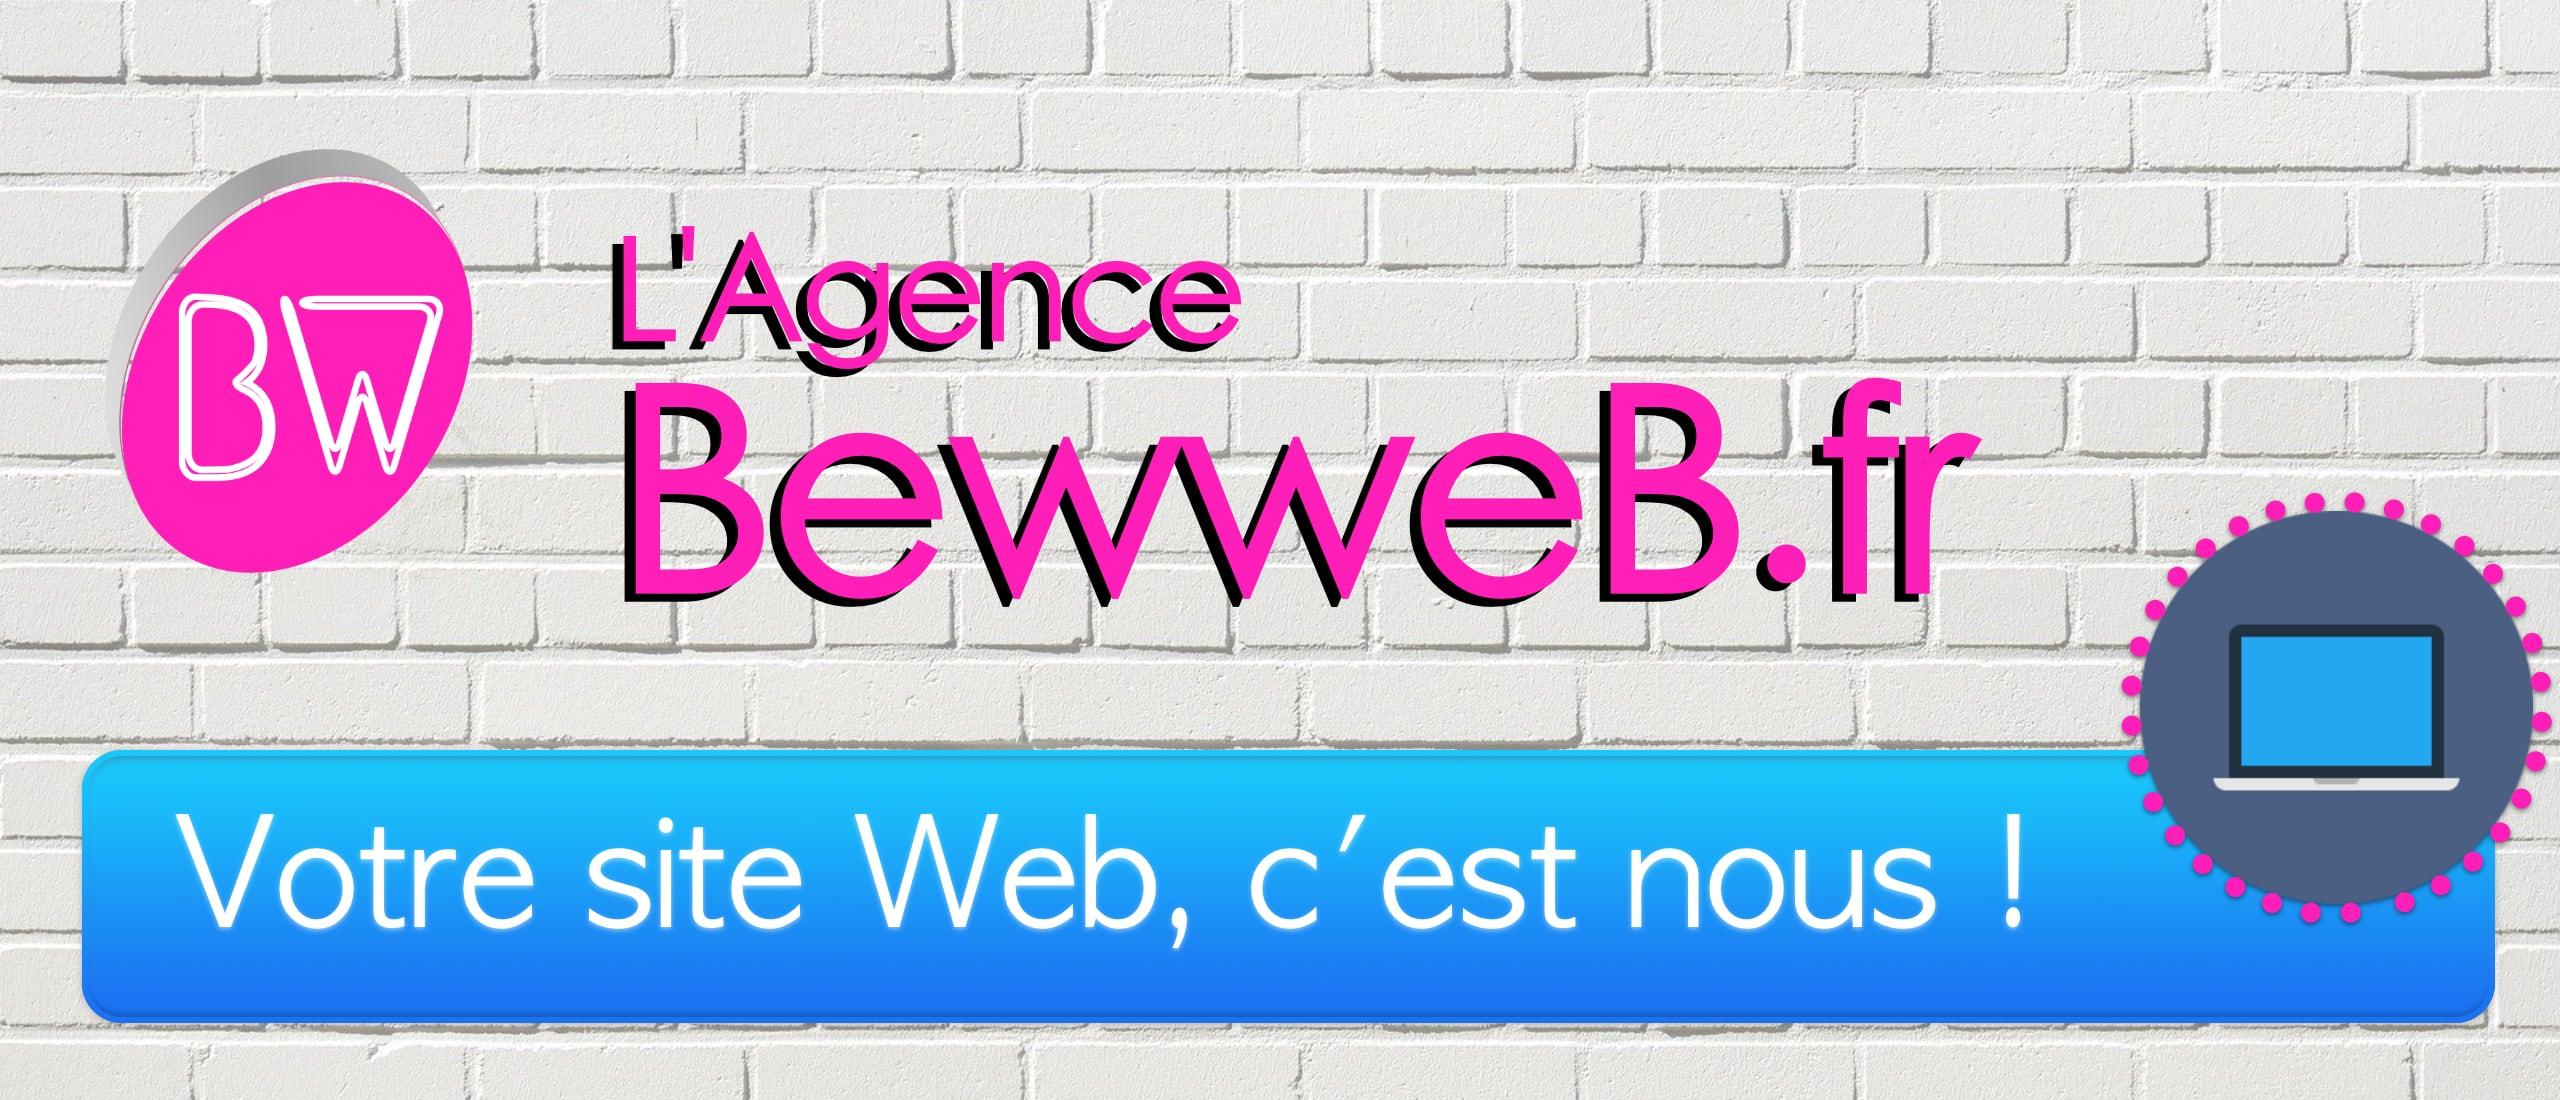 Entête site BewweB.fr Web